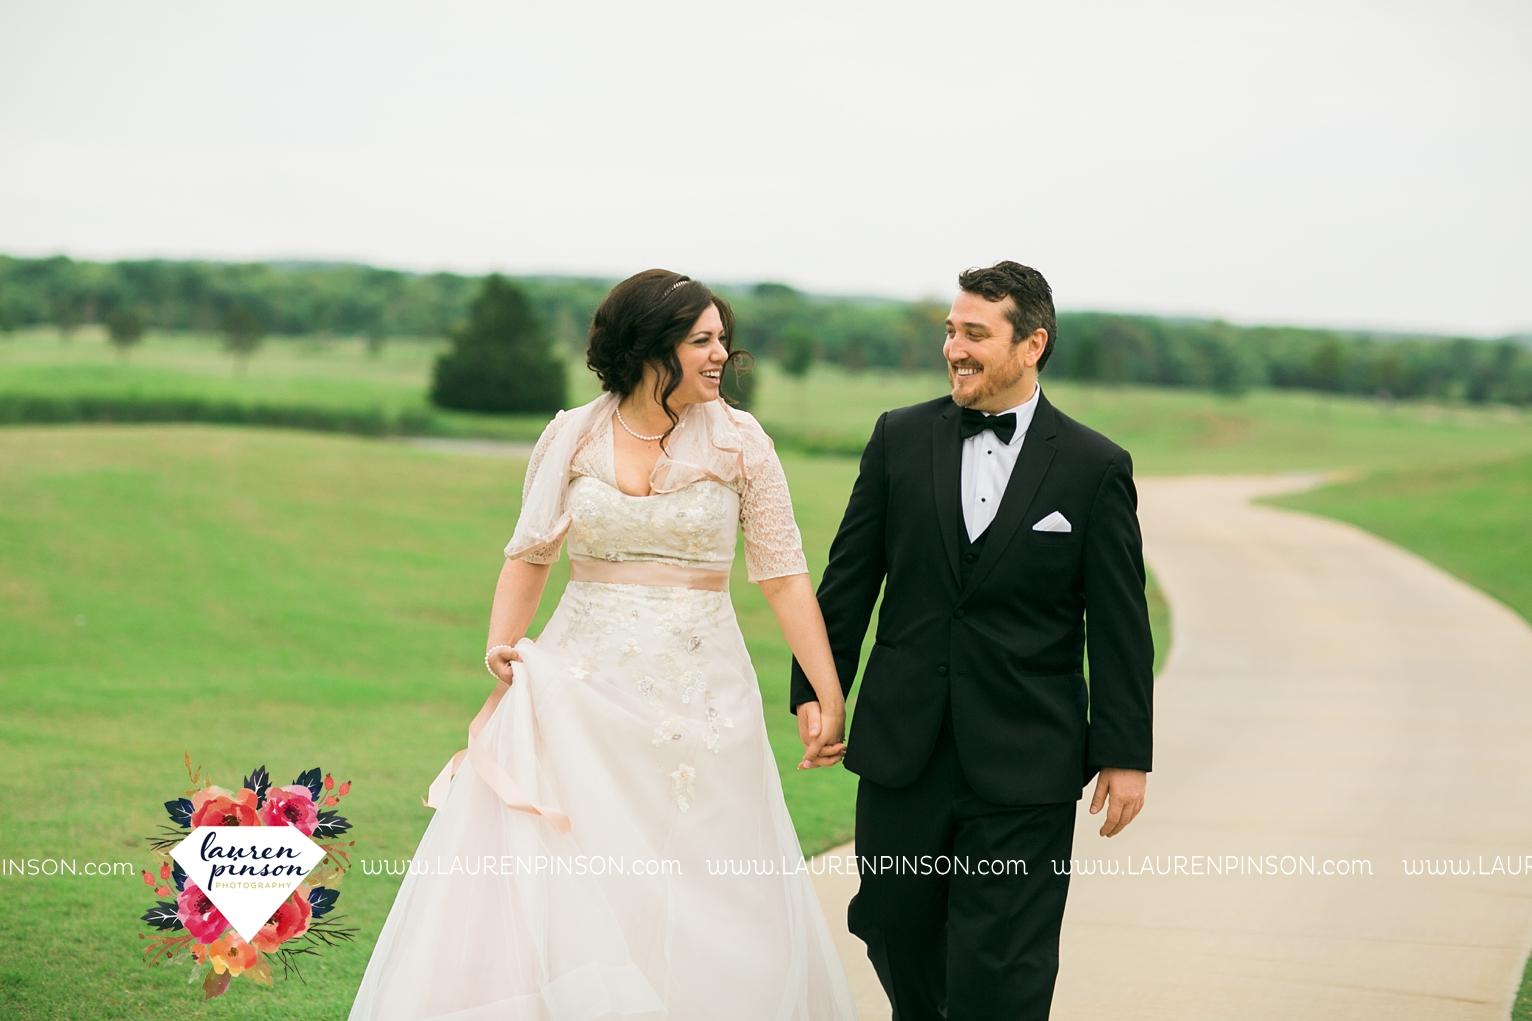 gainesville-texas-sherman-texas-thackerville-oklahoma-wedding-photographer-at-winstar-casino-golf-resort_2282.jpg